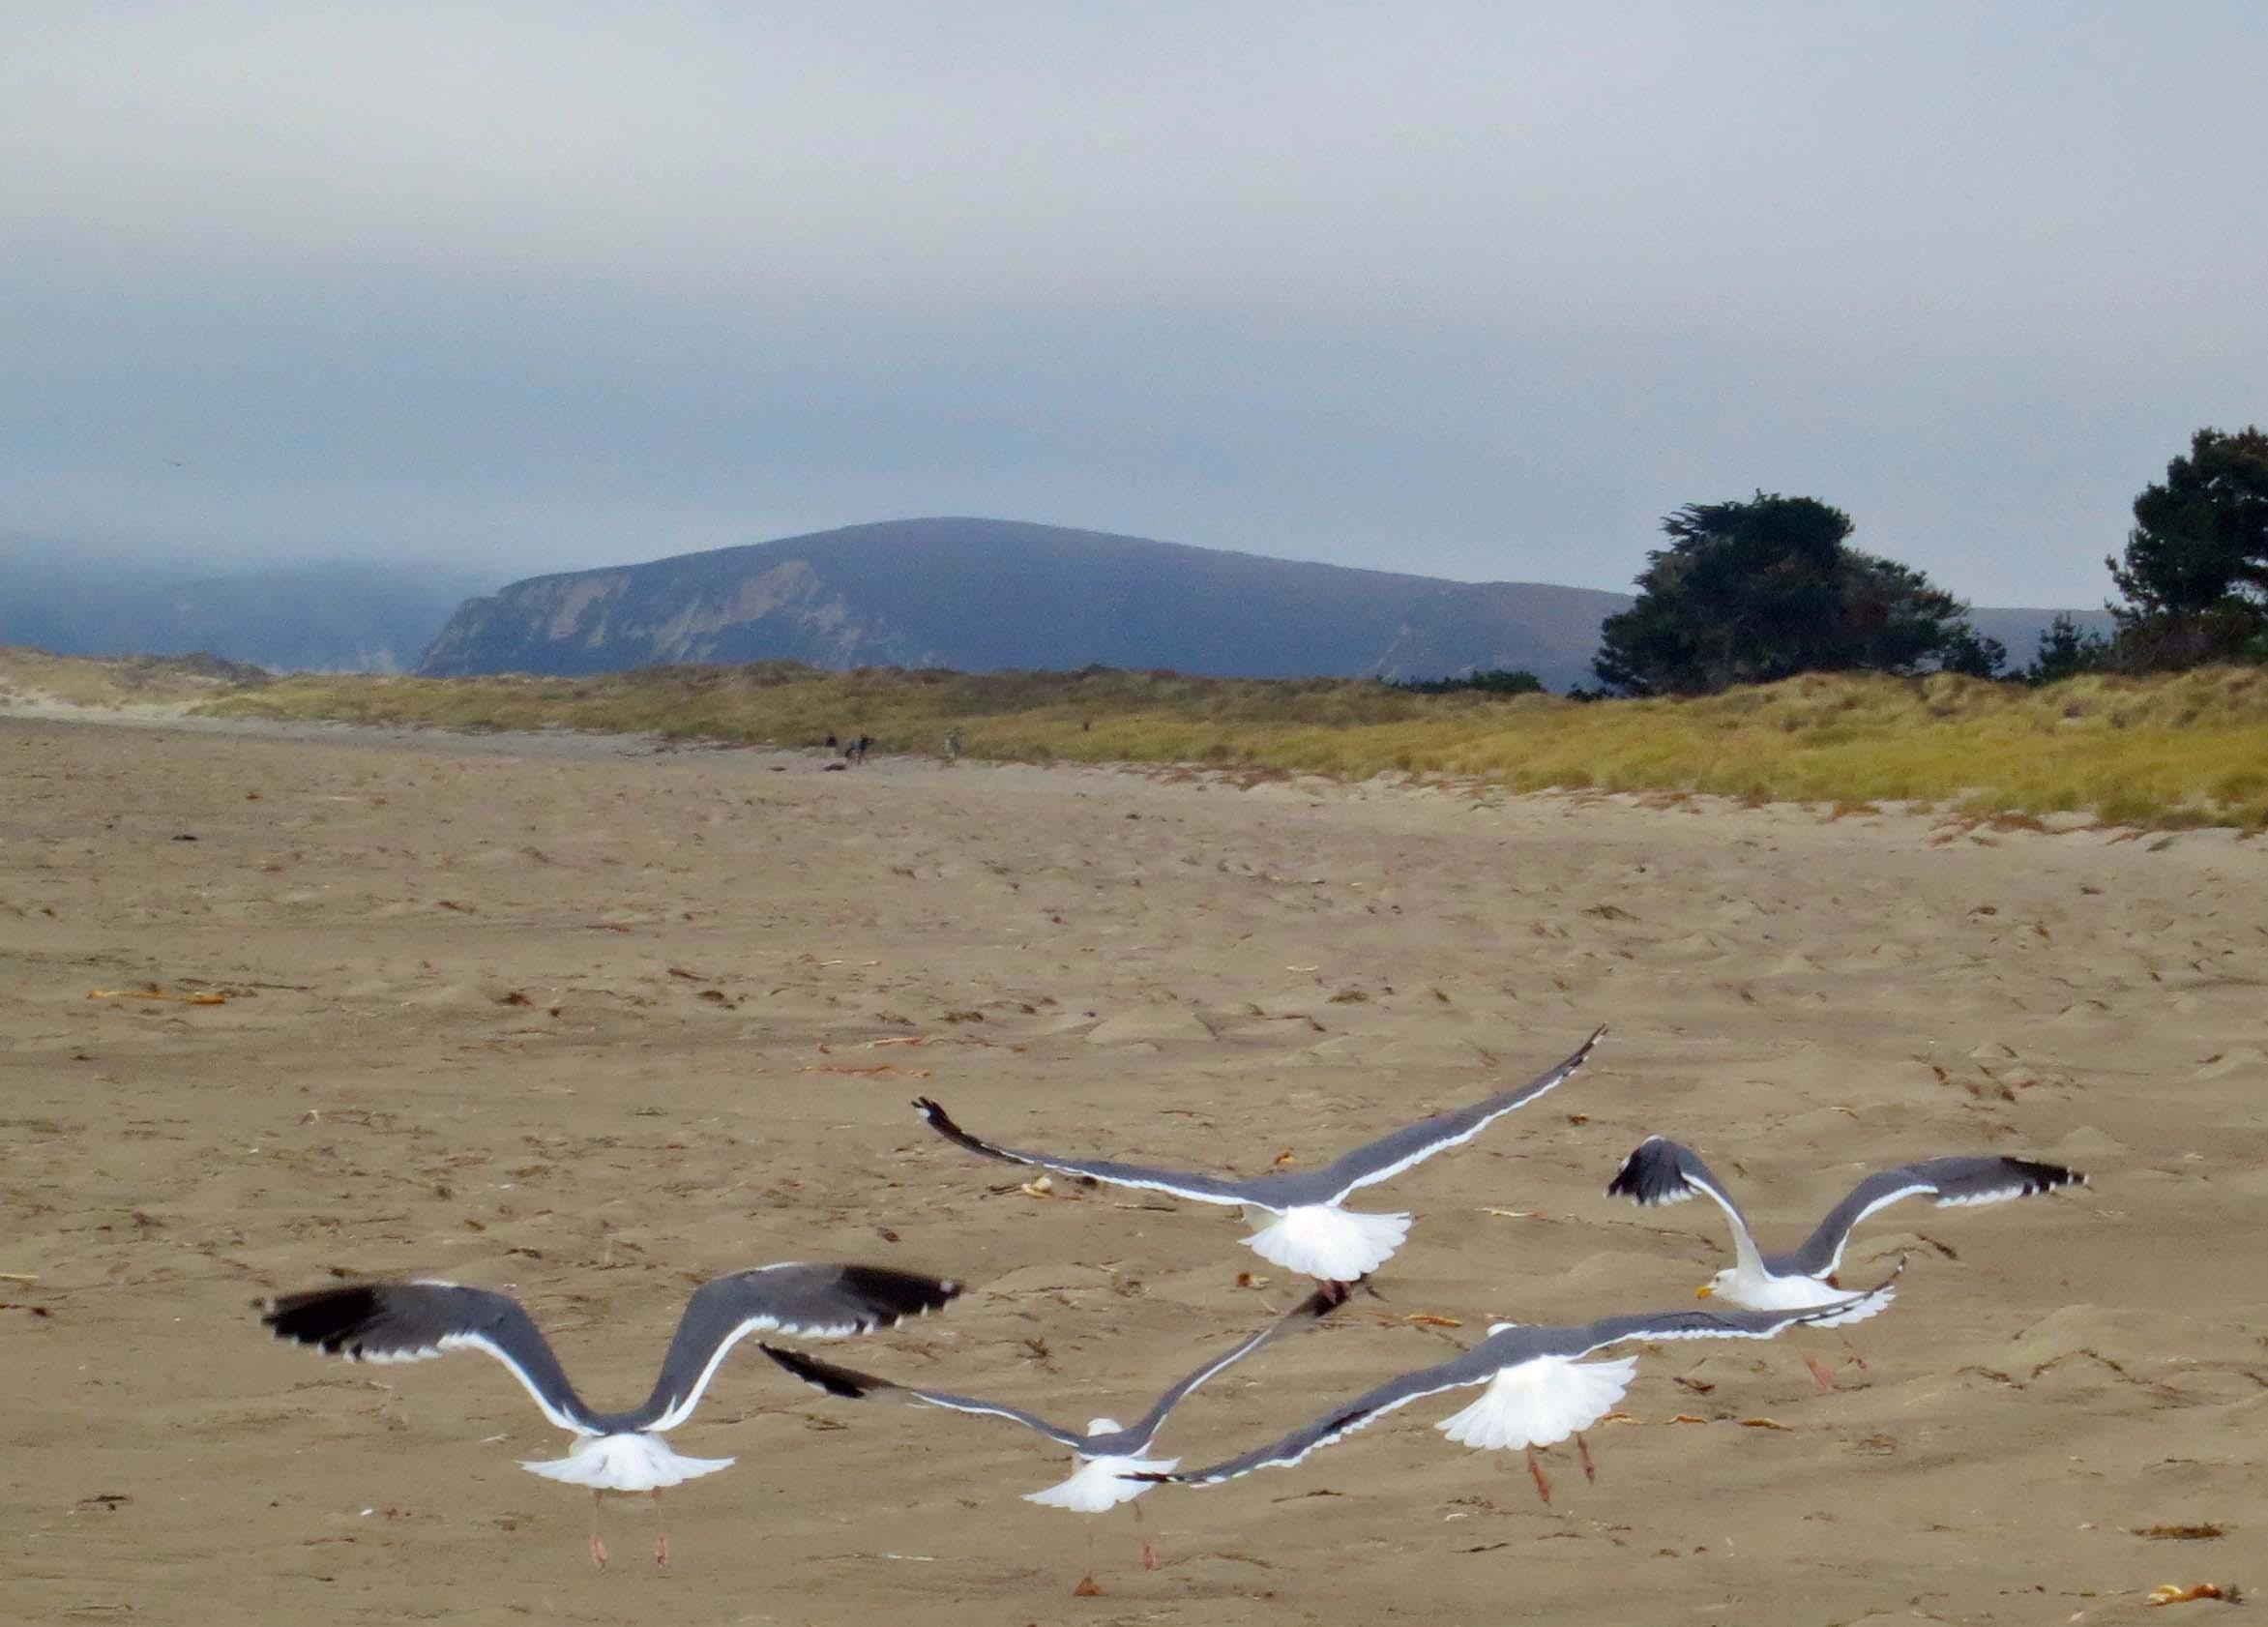 Sea gulls in flight on Limantour Beach at Pt. Reyes National Seashore. Photo by Curtis Mekemson.